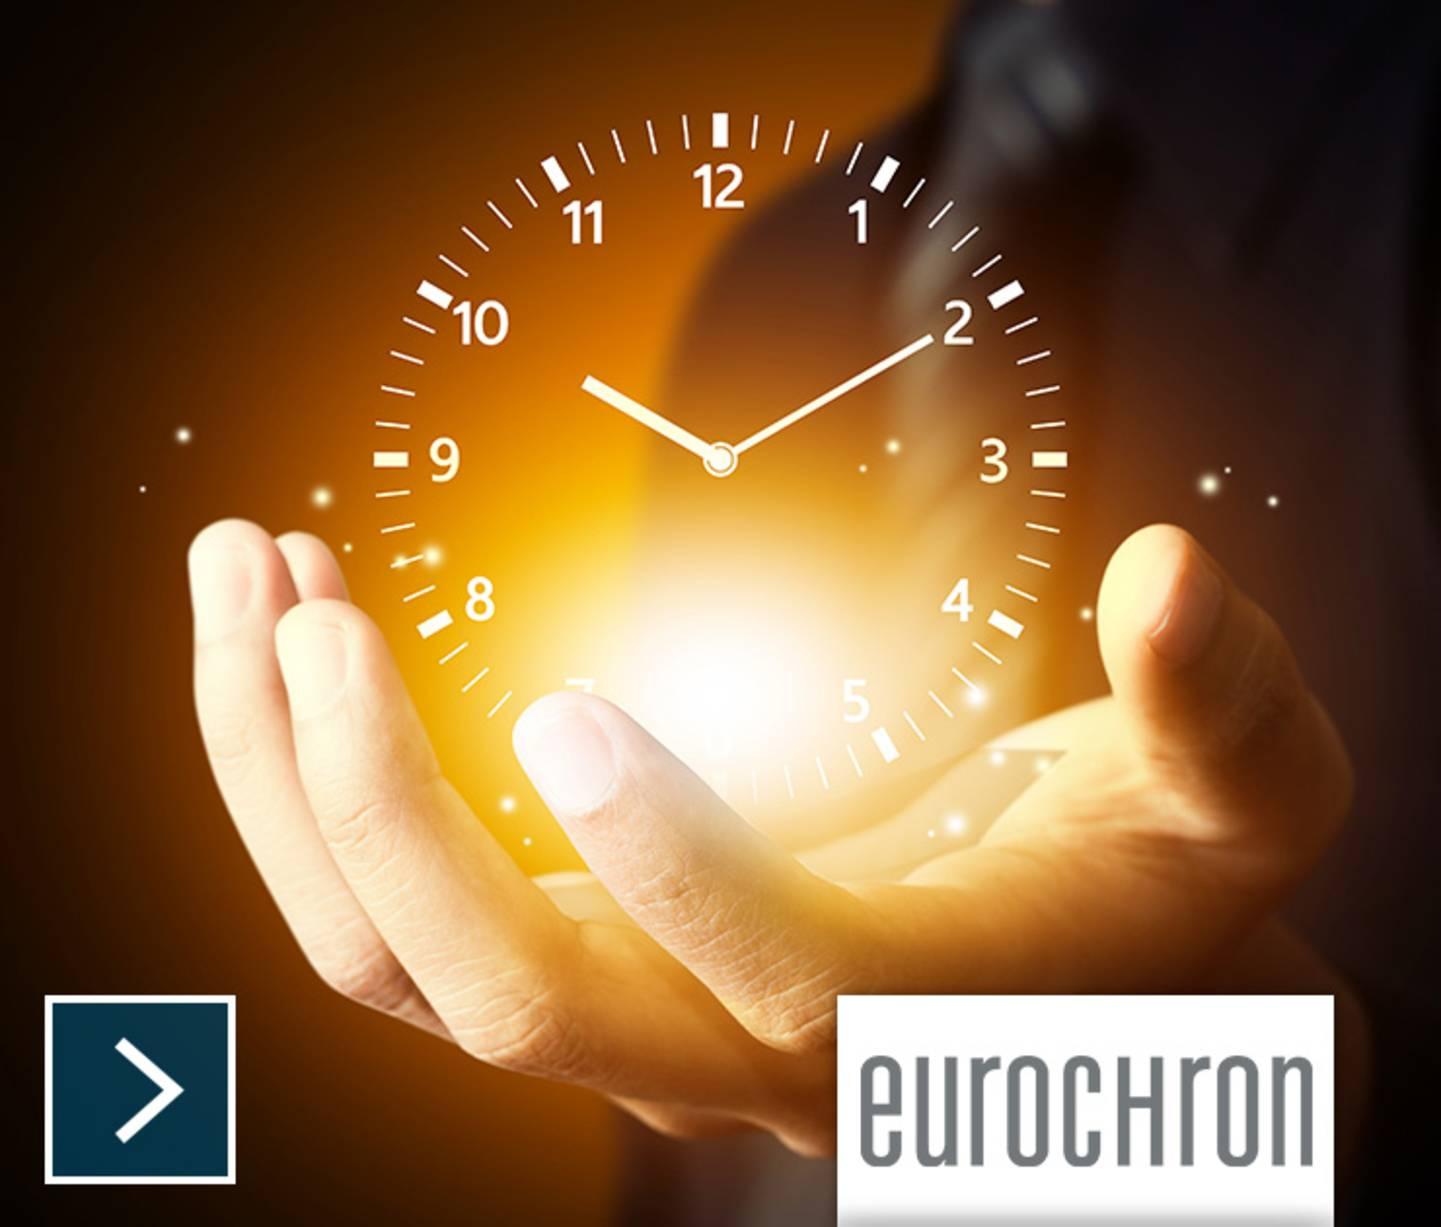 Eurochron »